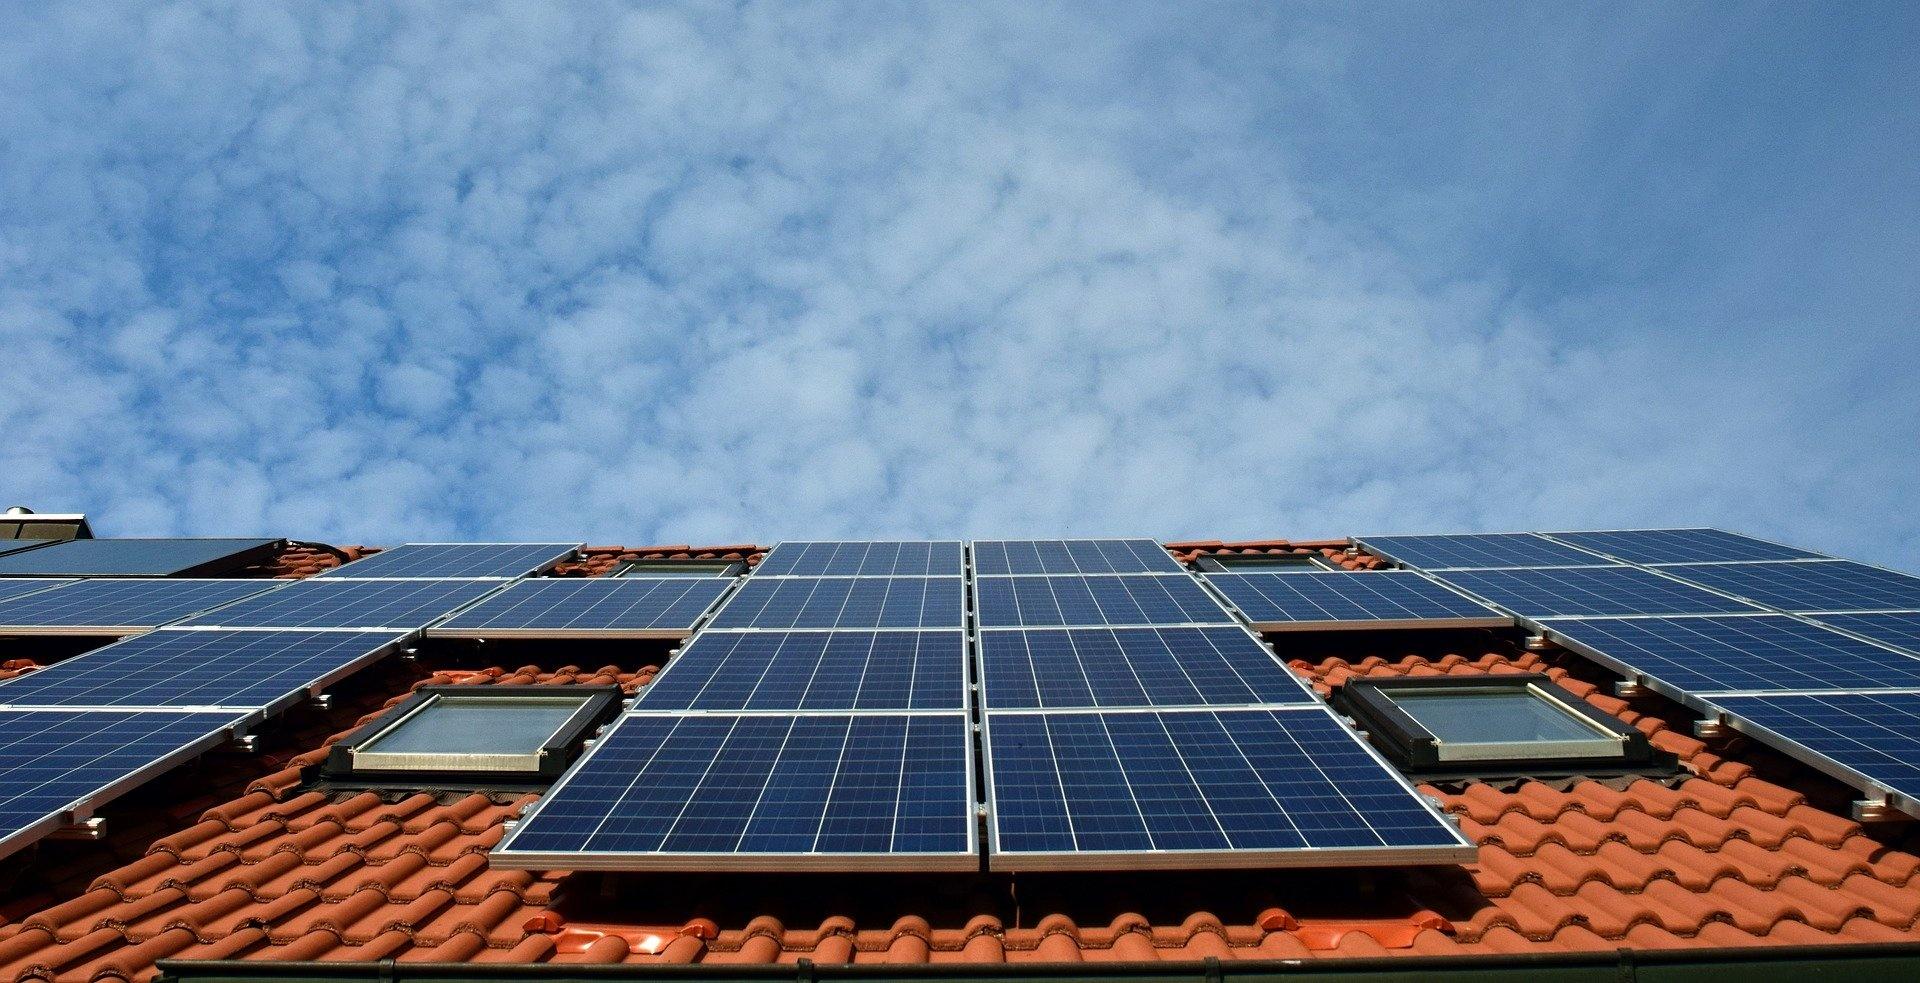 Solar Roof, Solar Panels, Solar Energy, YSG Solar